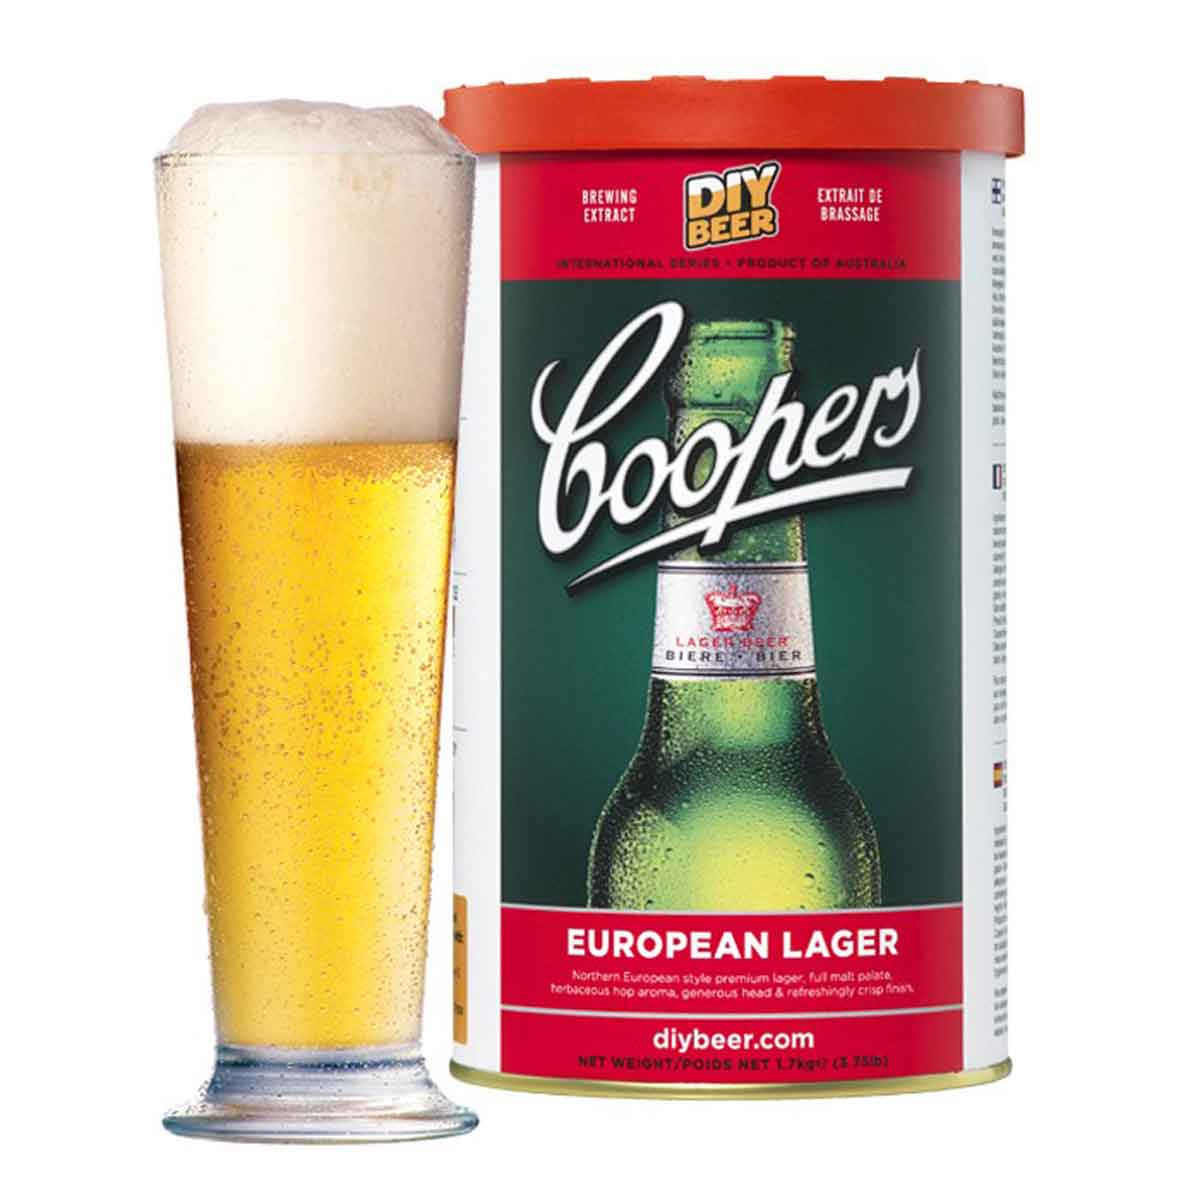 Malto per birra Coopers European Lager